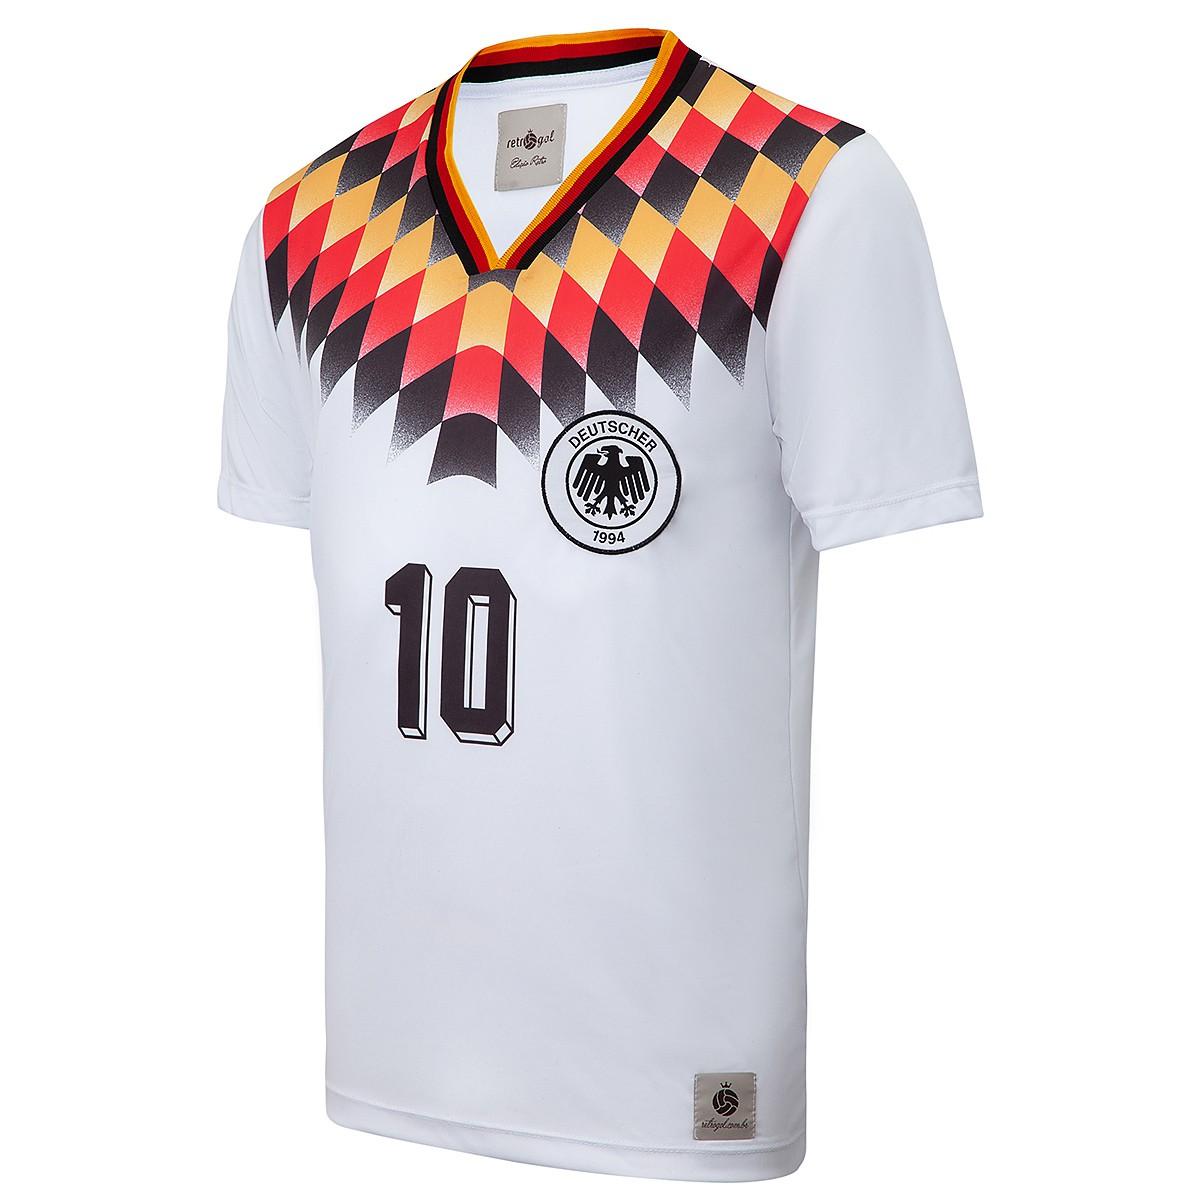 Camisa Alemanha Retrô 1994 Masculino